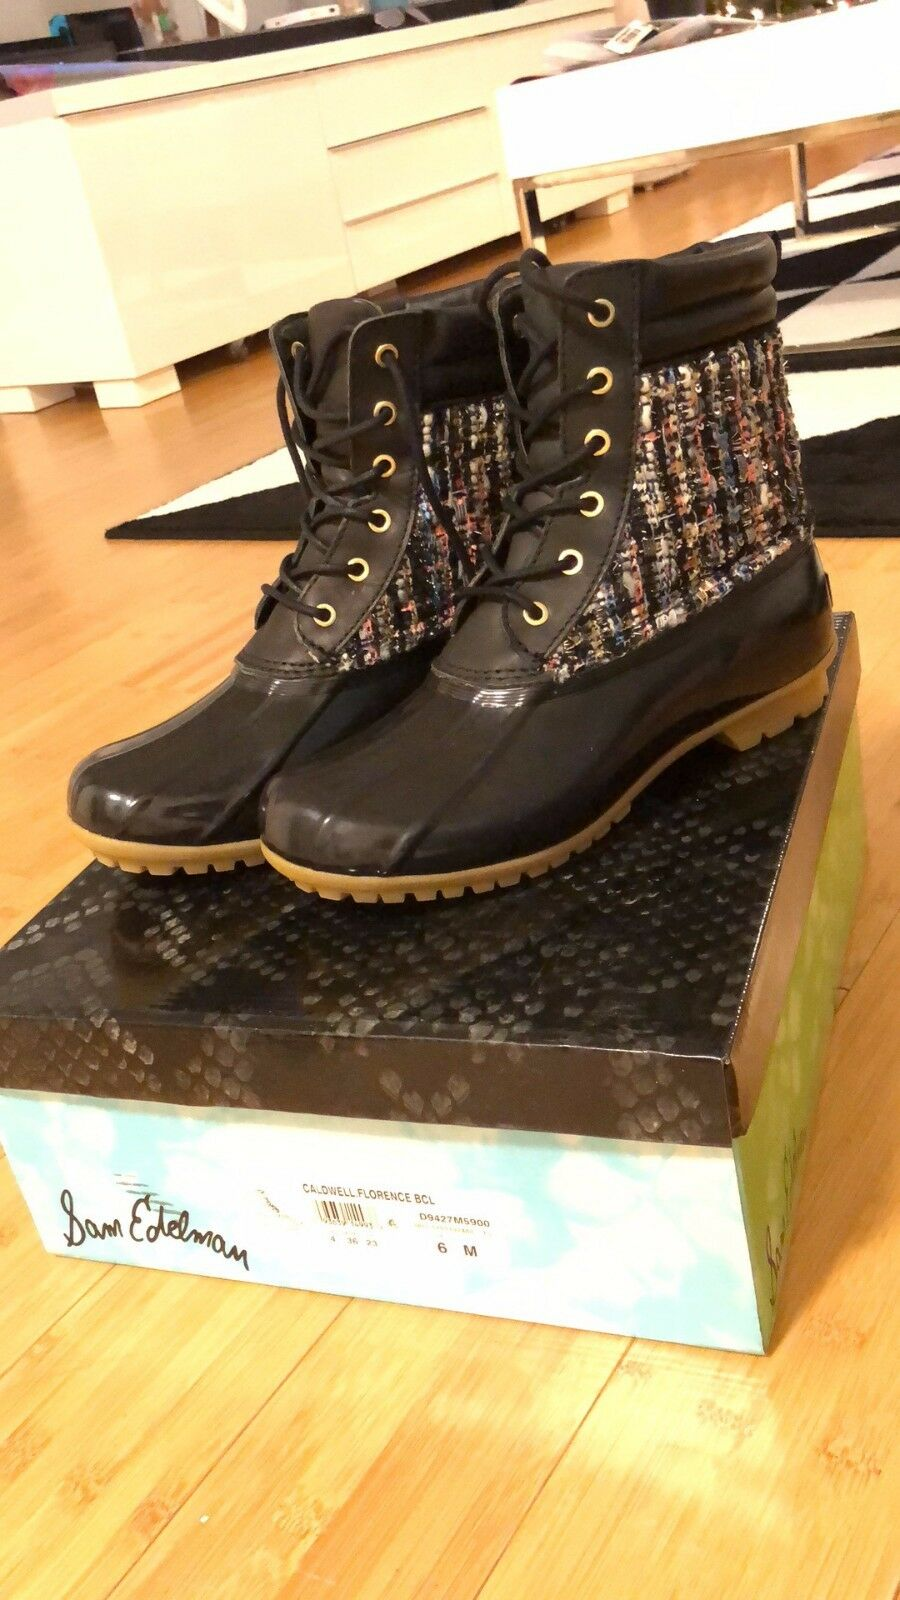 USED Sam Edelman Caldwell Florence Rain Snow Boots Multi Color Women Size 6 M